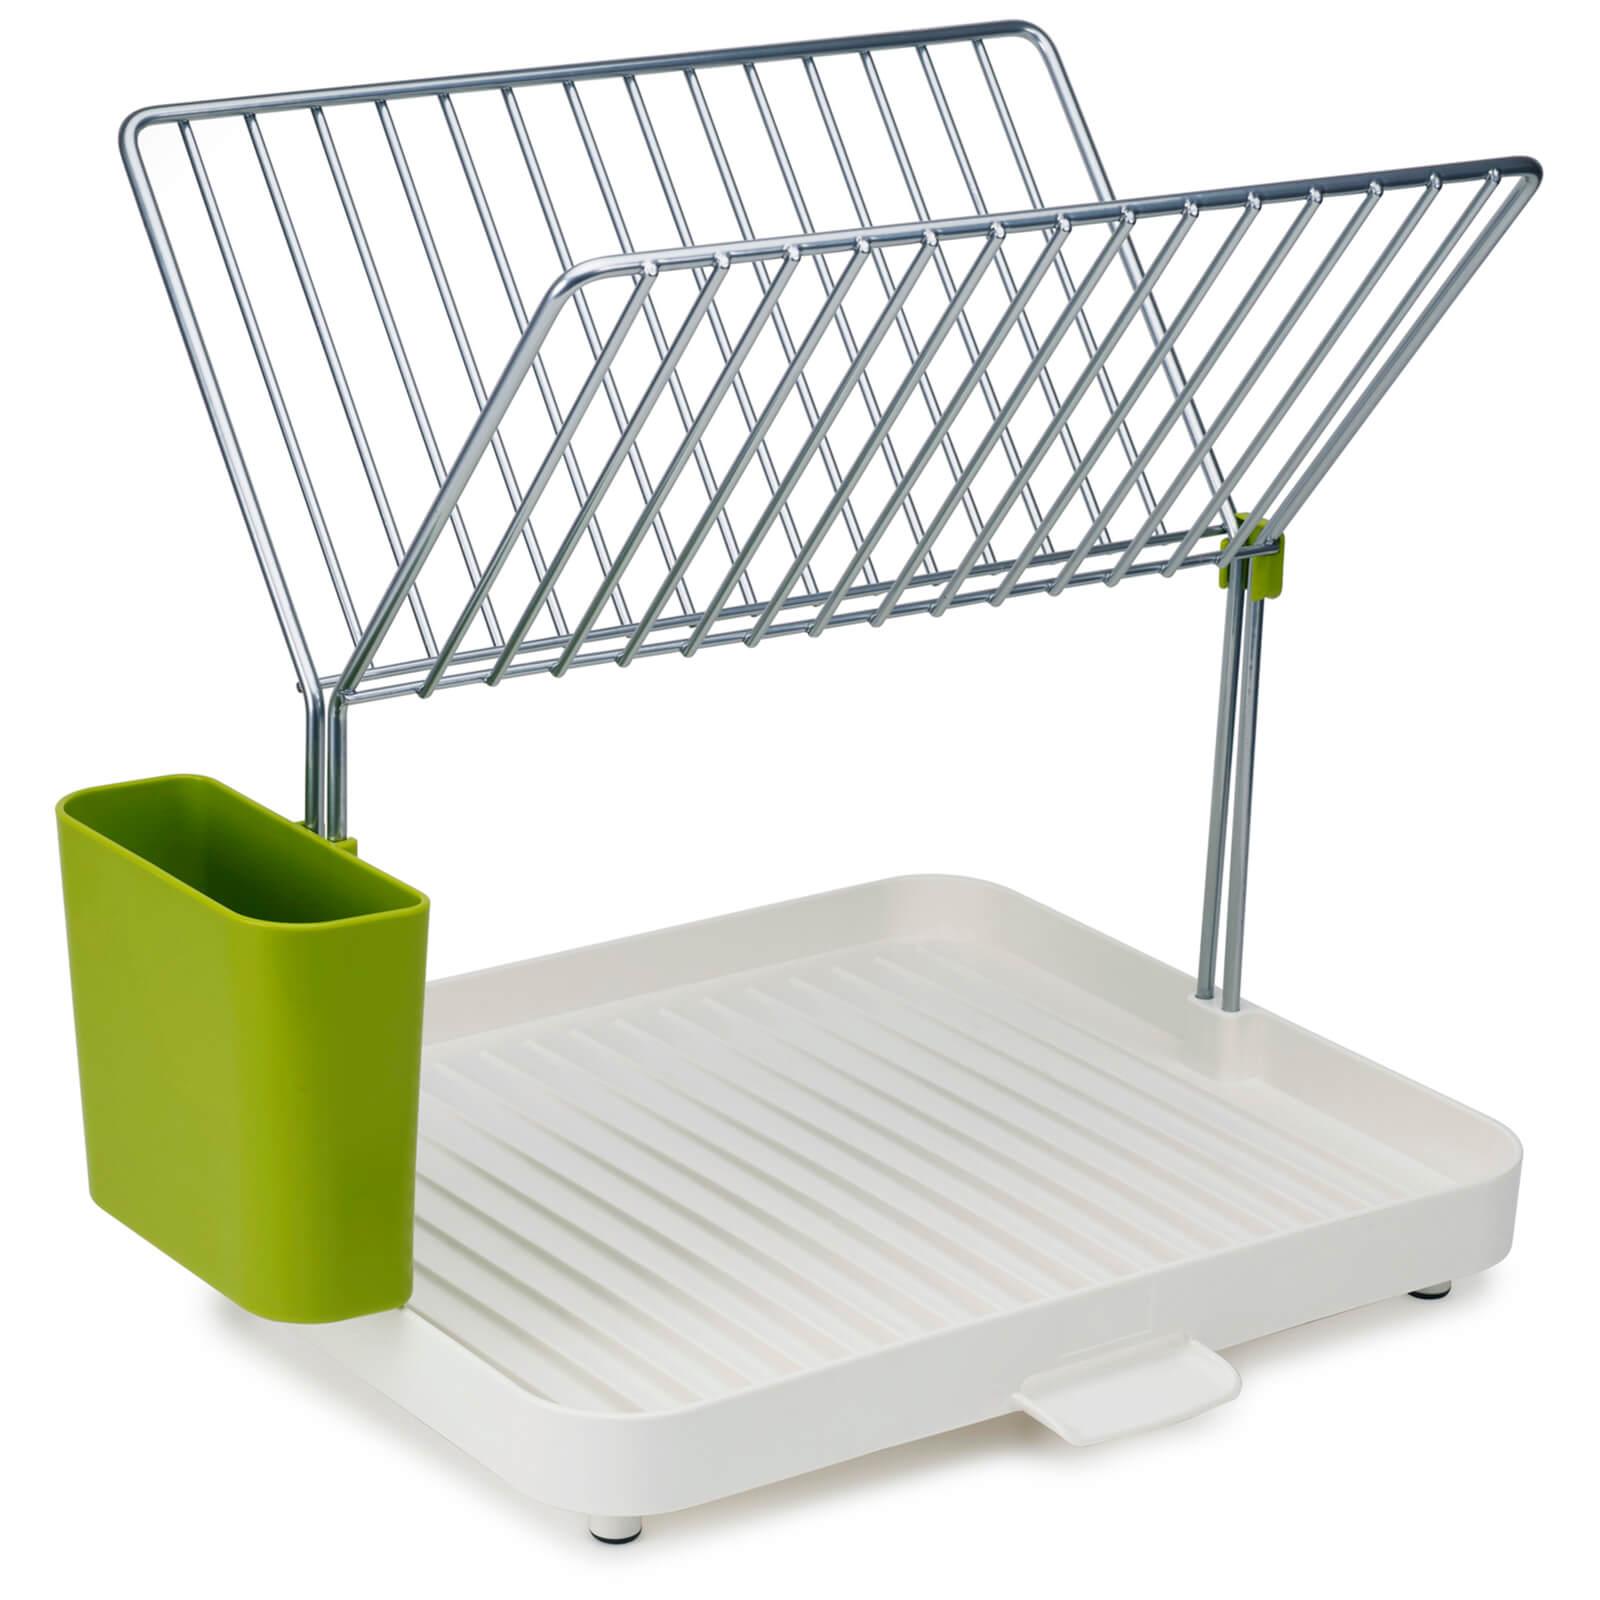 Joseph Joseph Y-Rack Dish Drainer - White/Green